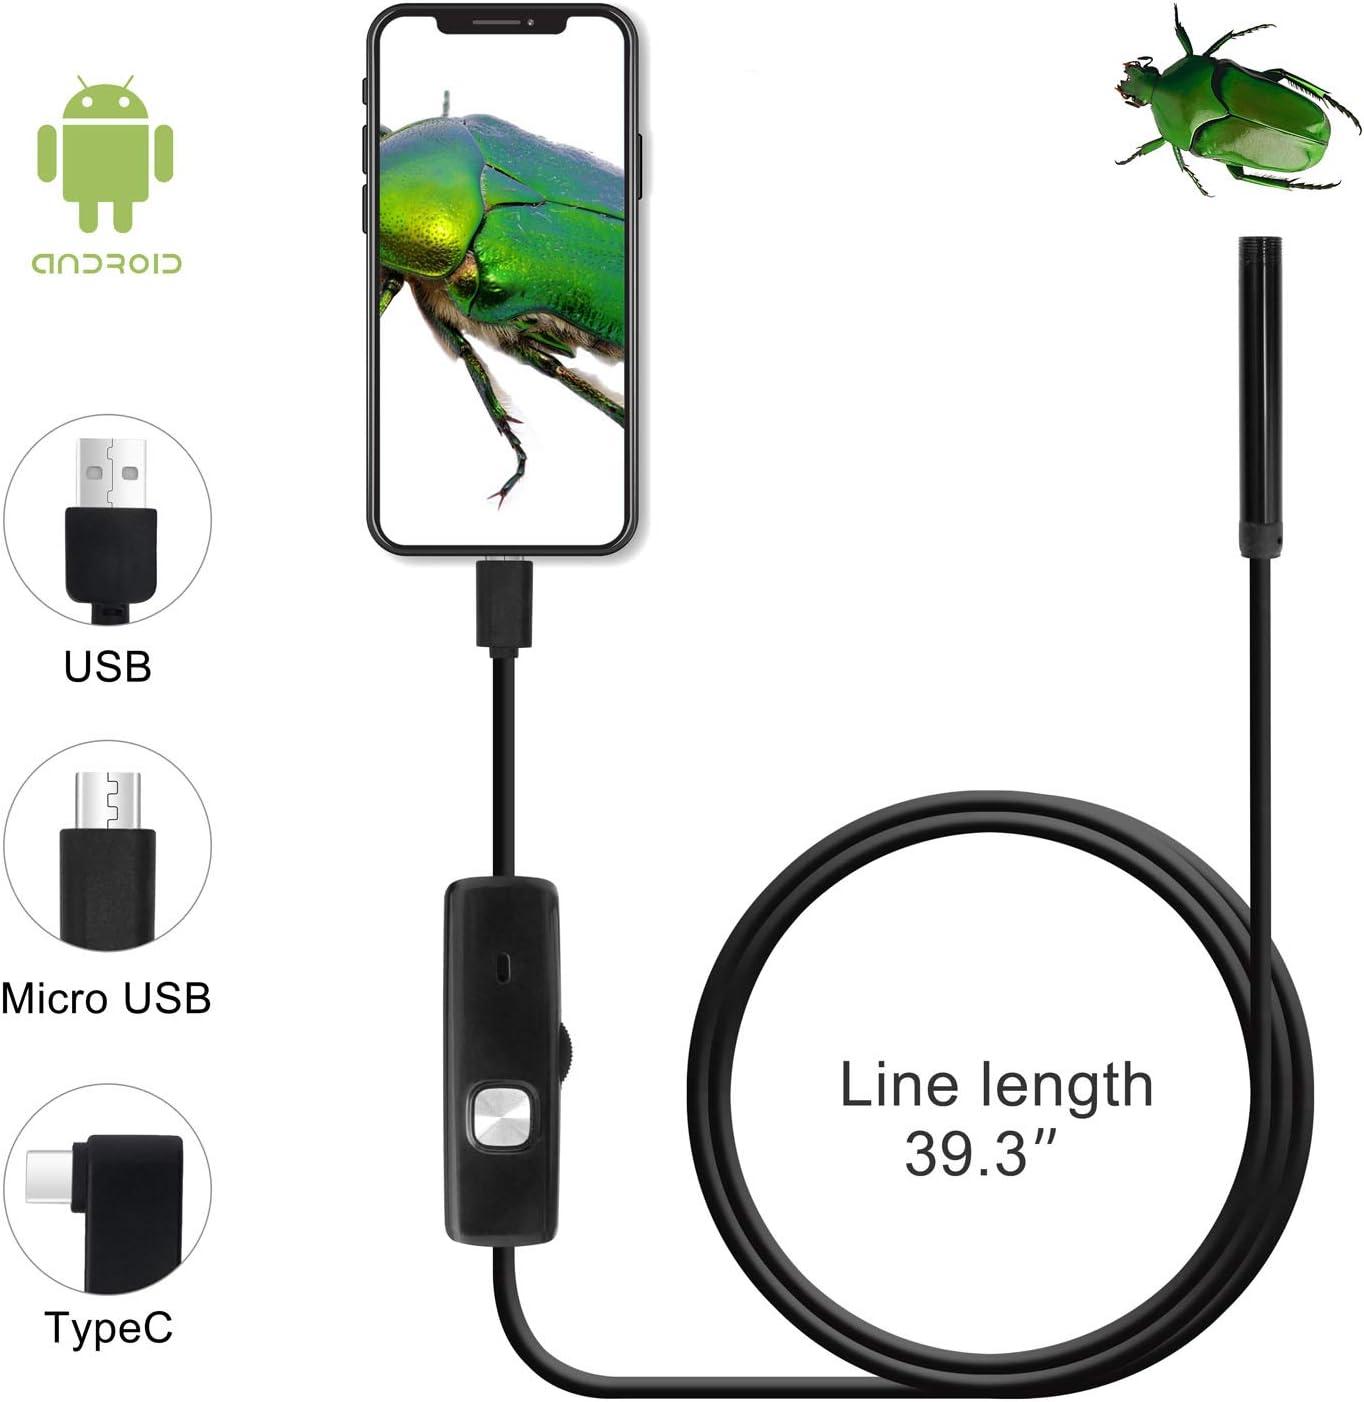 1m QiCheng/&LYS USB Android Endoskop 2,0 Megapixel CMOS HD 2 in 1 wasserdichte Endoskop Inspektionskamera Starre Schlangenkabel f/ür Smartphone Tablet-Ger/ät